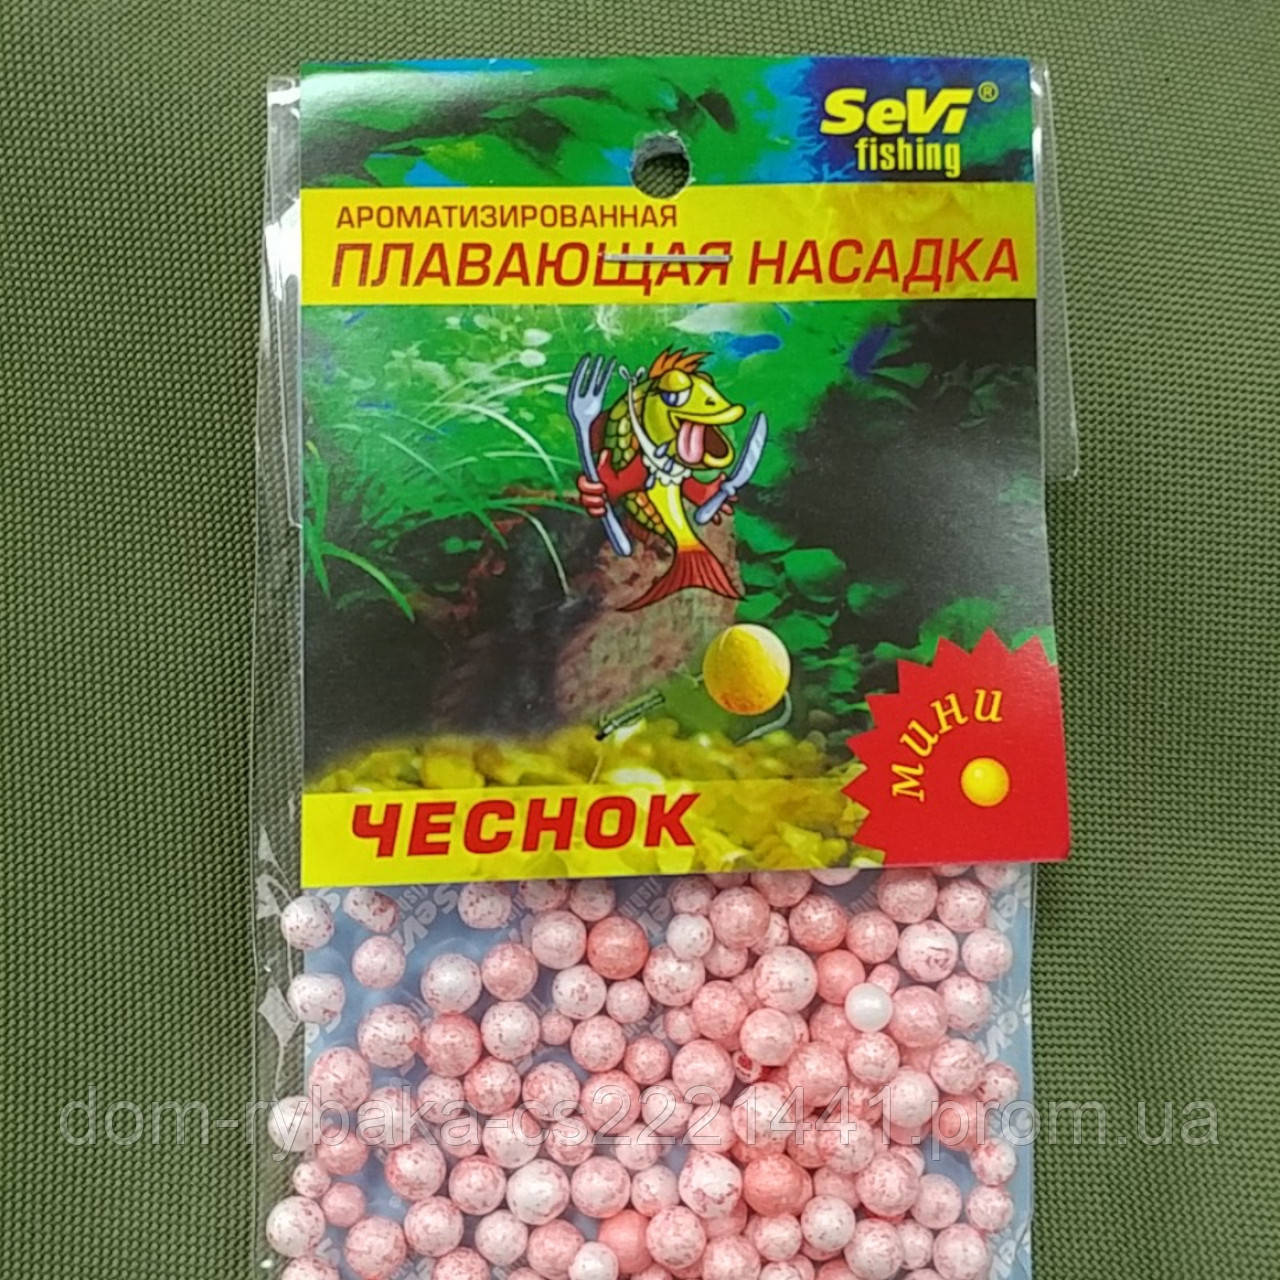 Пенопластовые шарики Sevi fishing Чеснок Мини(9991795)